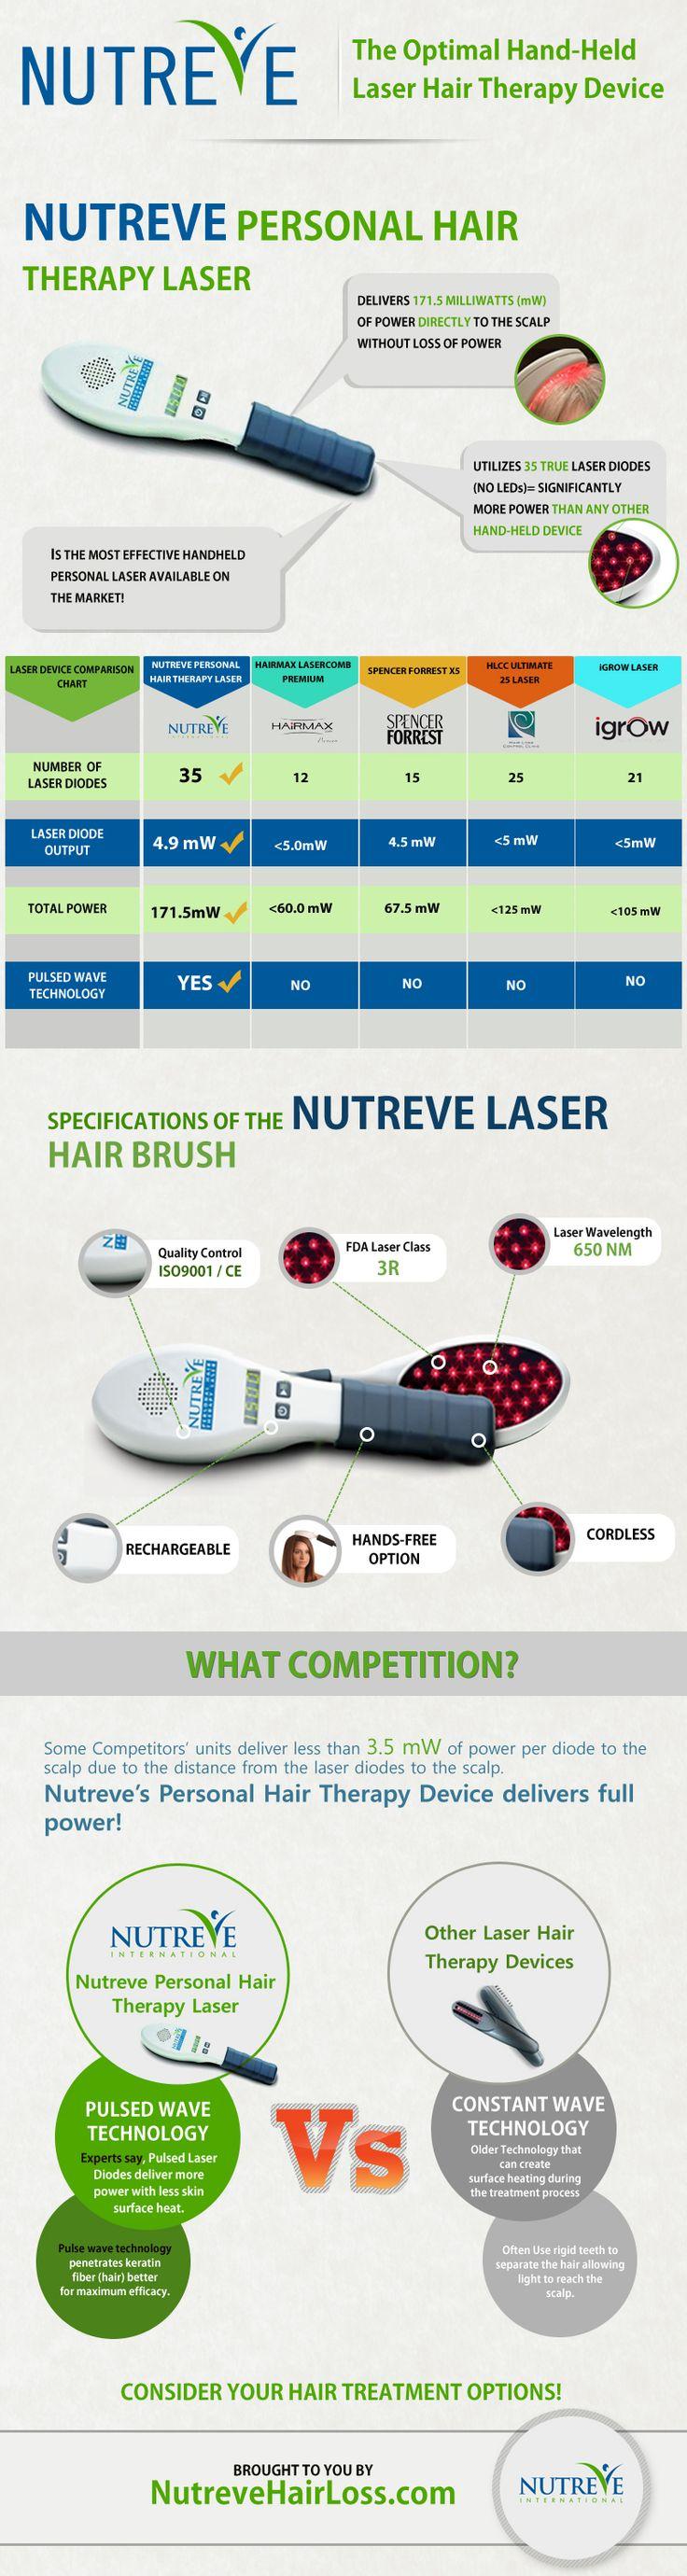 https://www.nutrevehairloss.com/a-laser-hair-comb-for-the-new-millennium/  A Laser Hair Comb For The New Millennium - Nutreve Hair Therapy Laser [Infograph]